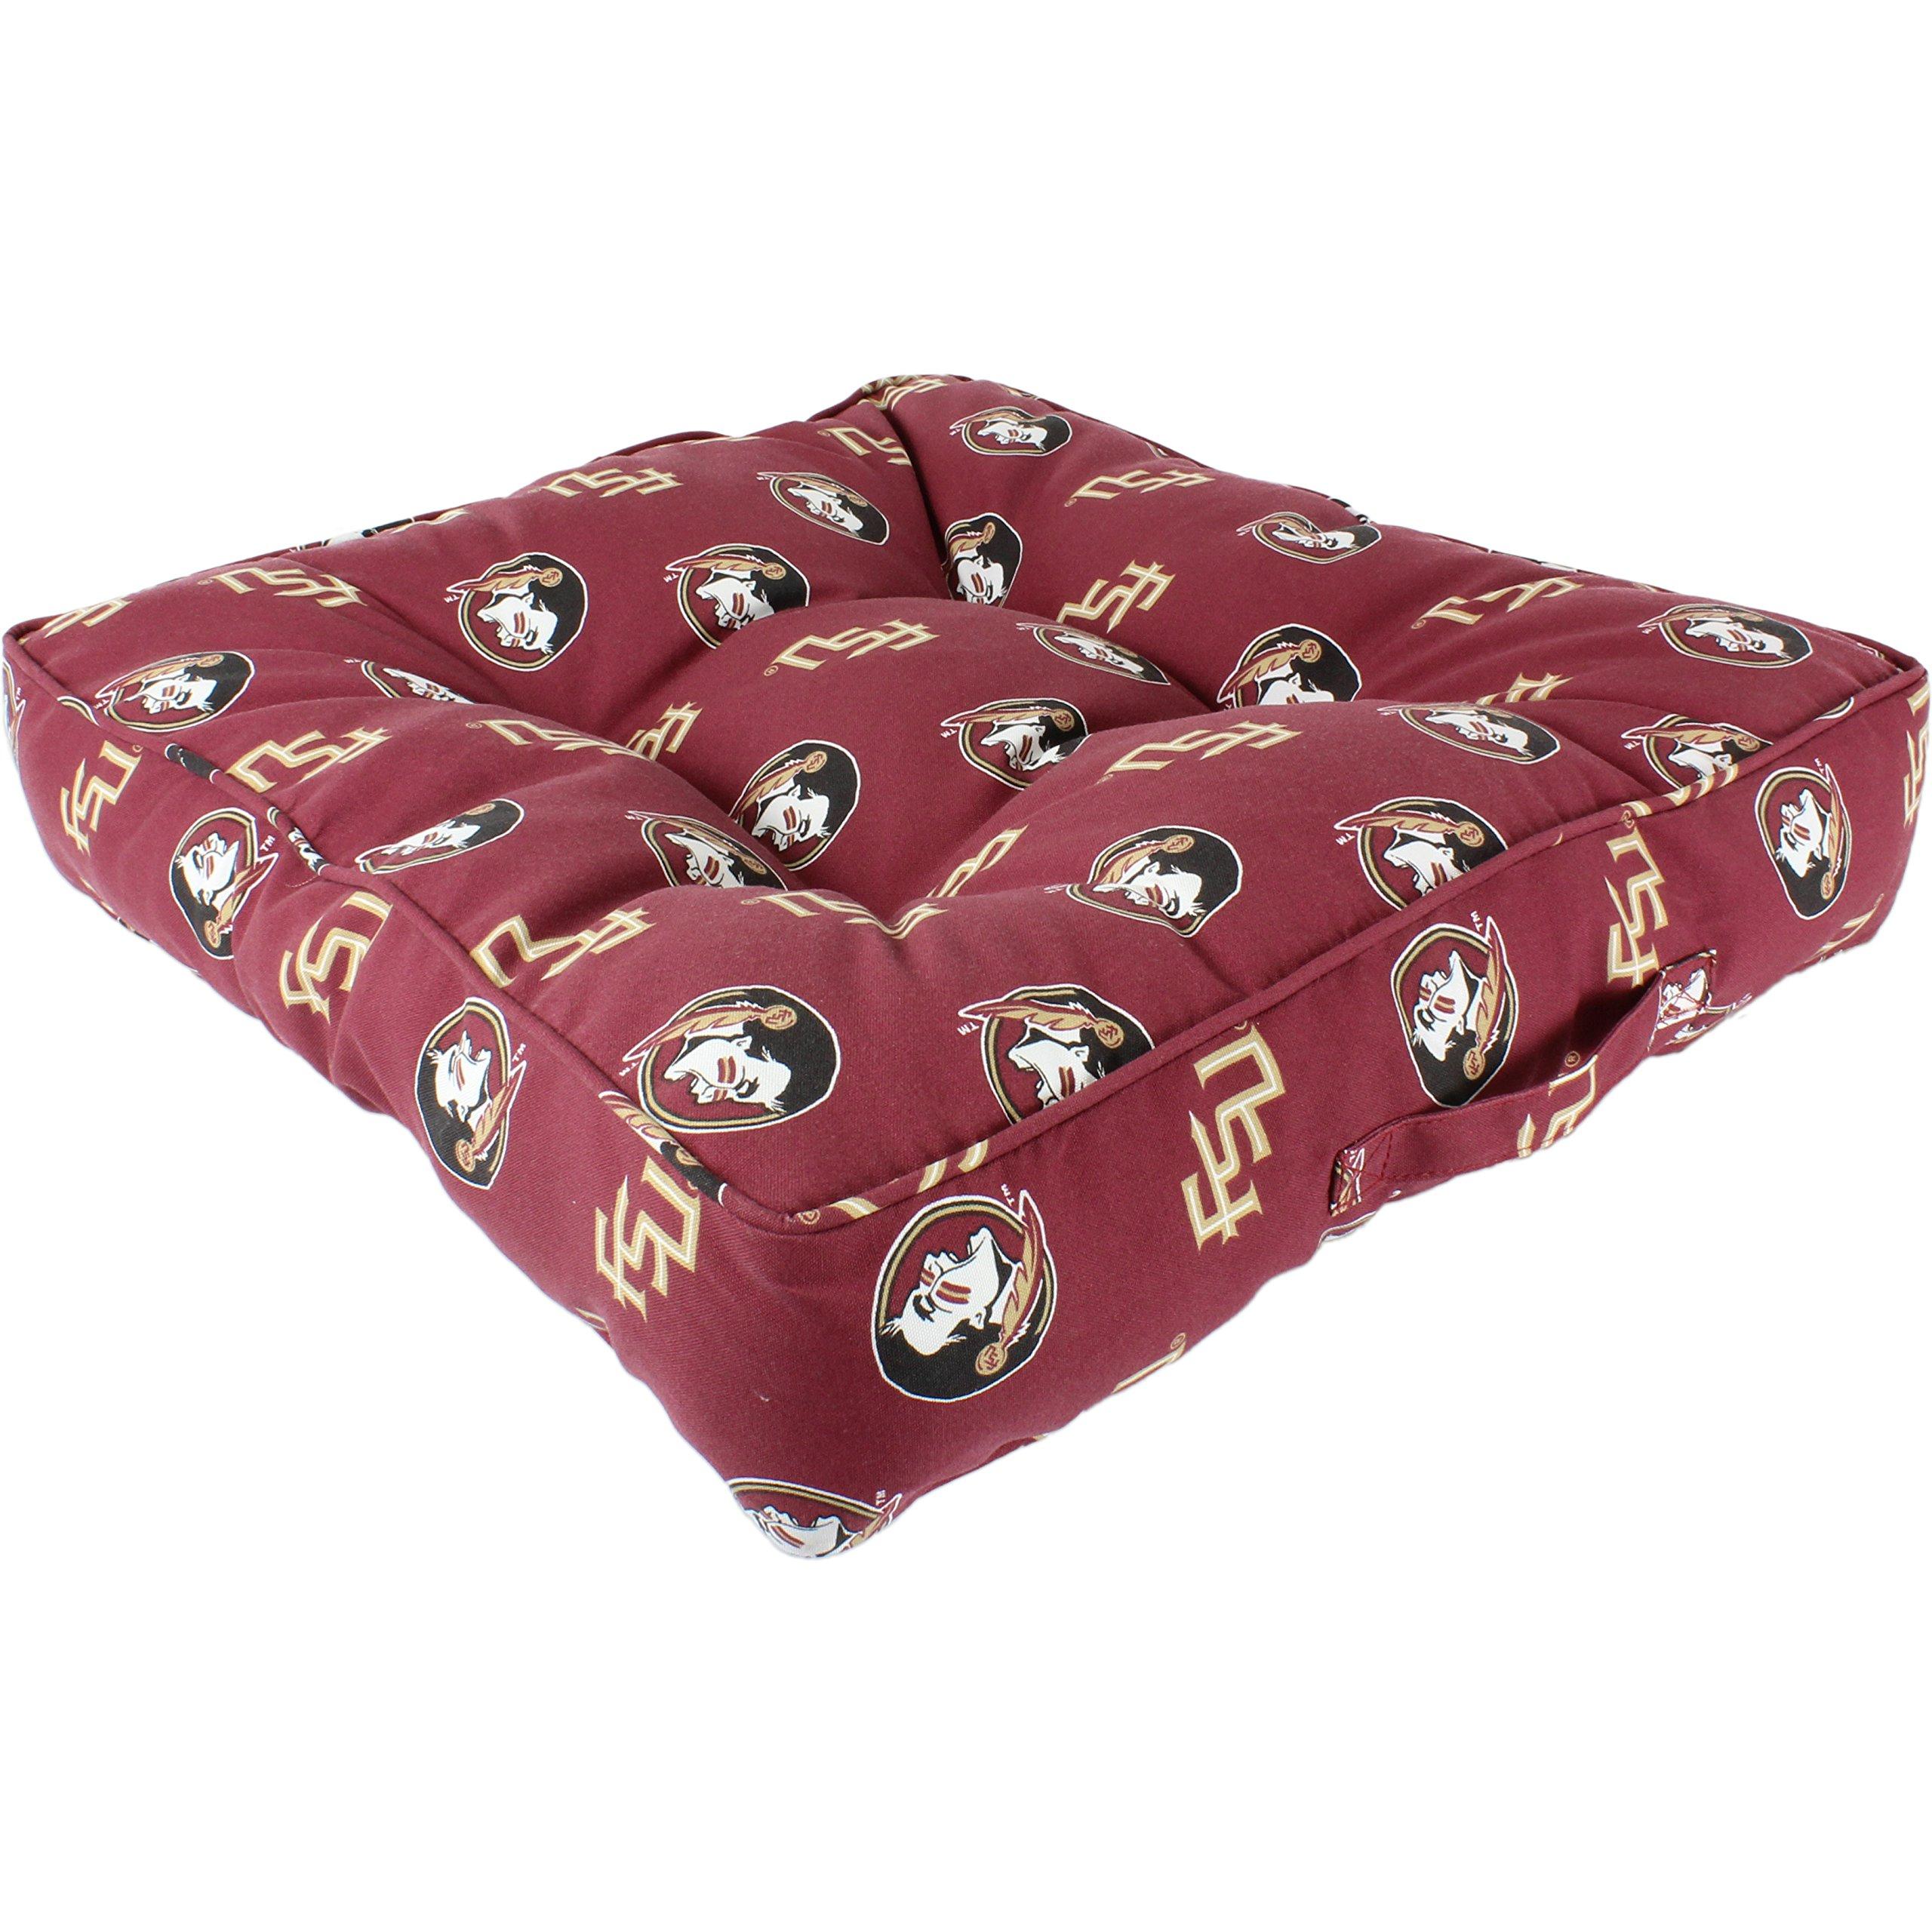 College Covers Florida State Seminoles Floor Pillow/Pet Bed, 24'' x 24'', Multi/Color